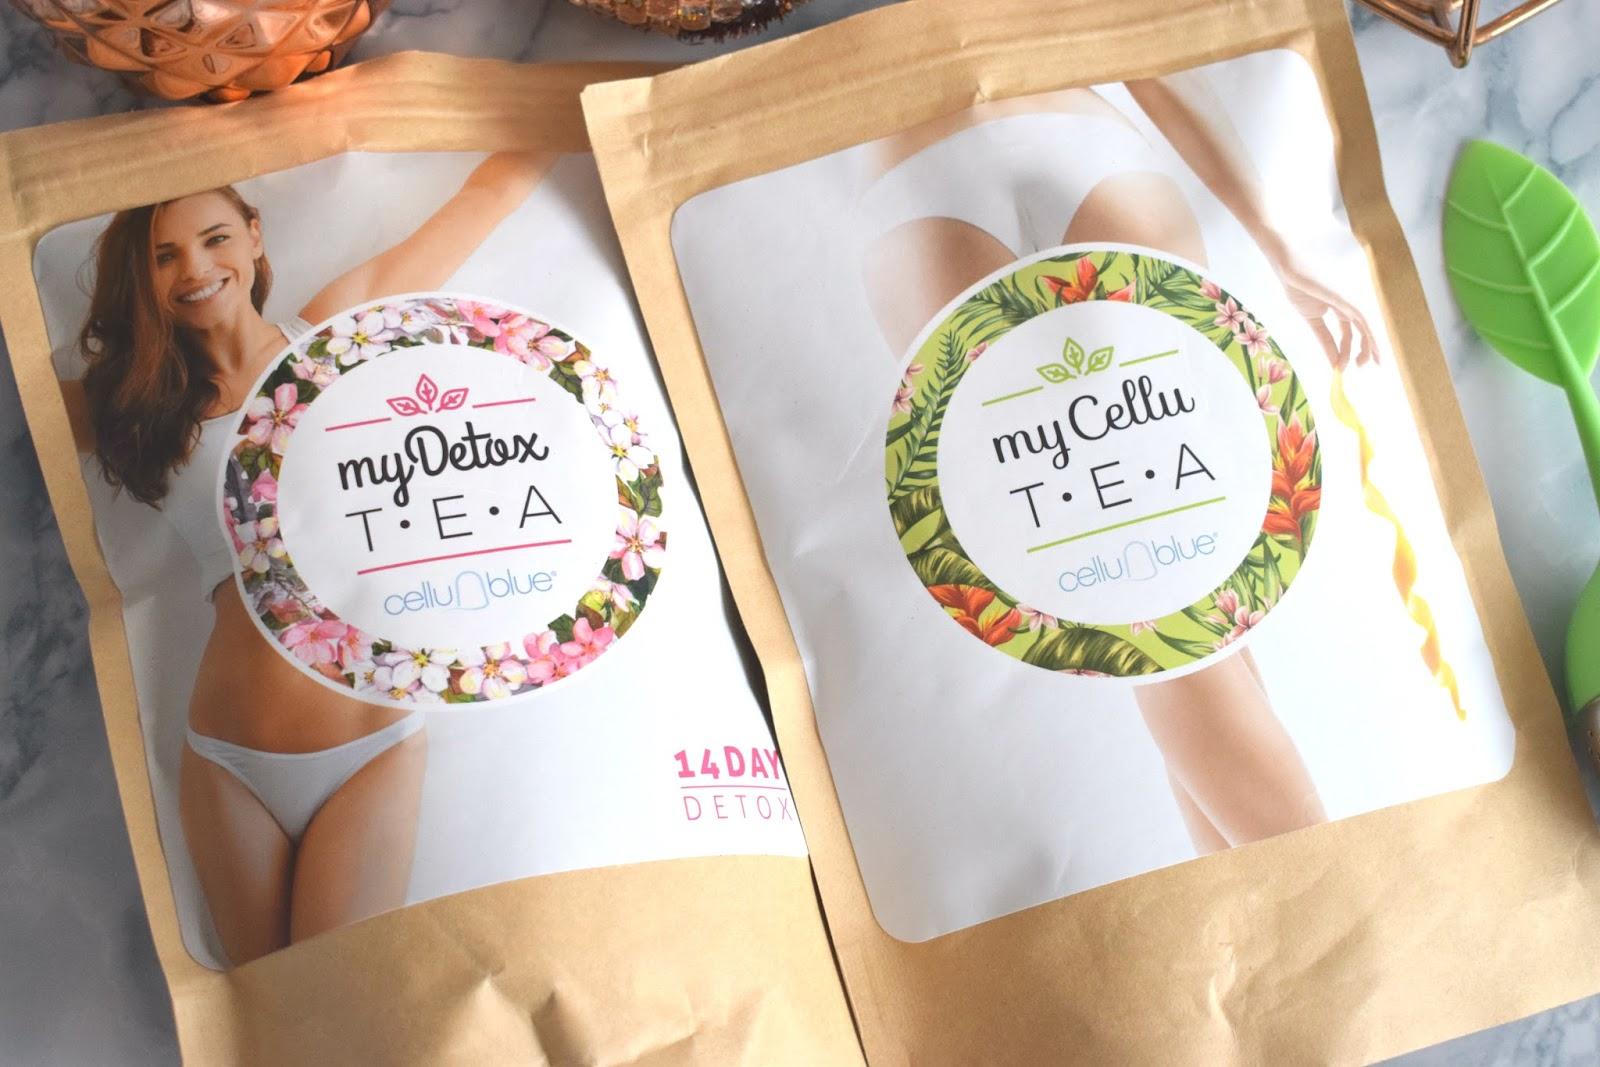 Merveille Beauté: My Detox Tea & My Cellu Tea de Cellublue